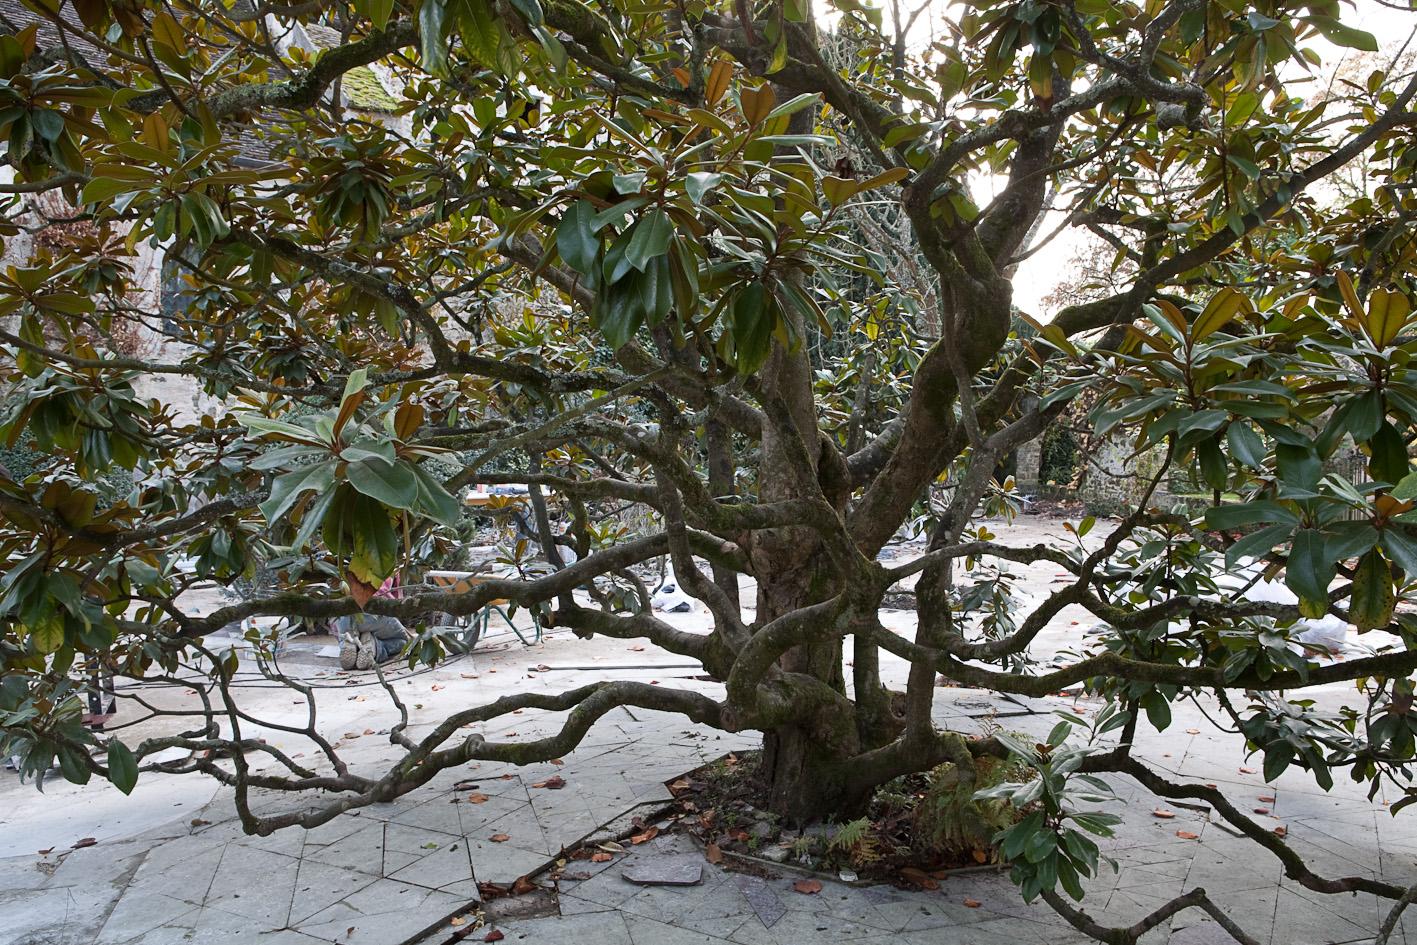 Revue jardins valentine de ganay un jardin persan en le for Jardins remarquables ile de france